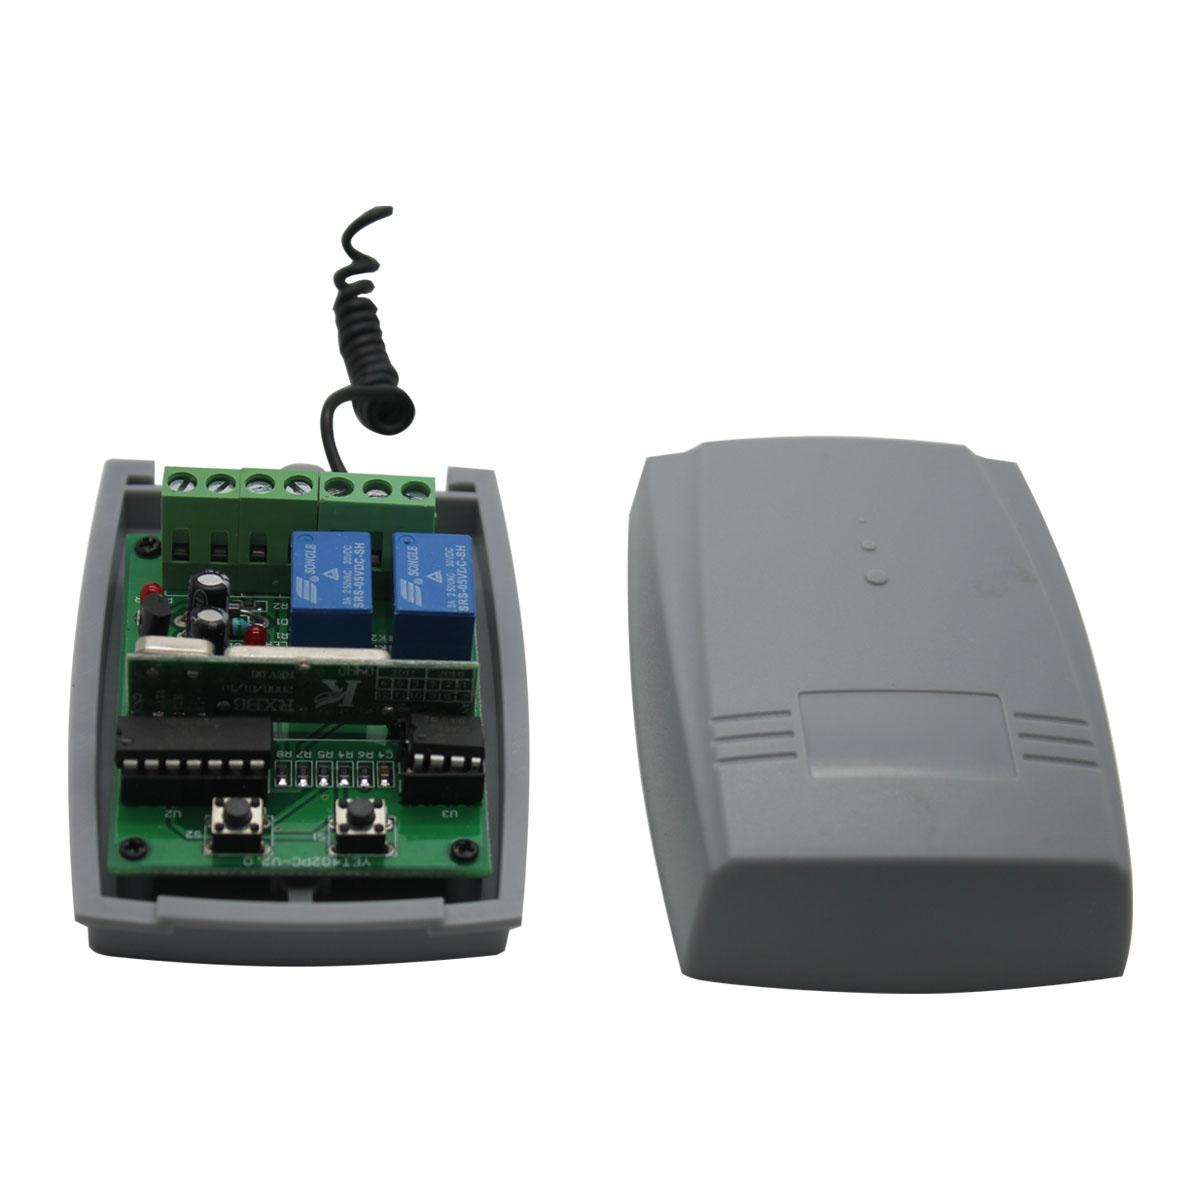 Store 20transmitters DC12V/24V 2CH wireless remote control receiver YET402pc-v2.0 - Shenzhen Yaoertai Technology Development Co., Ltd. store